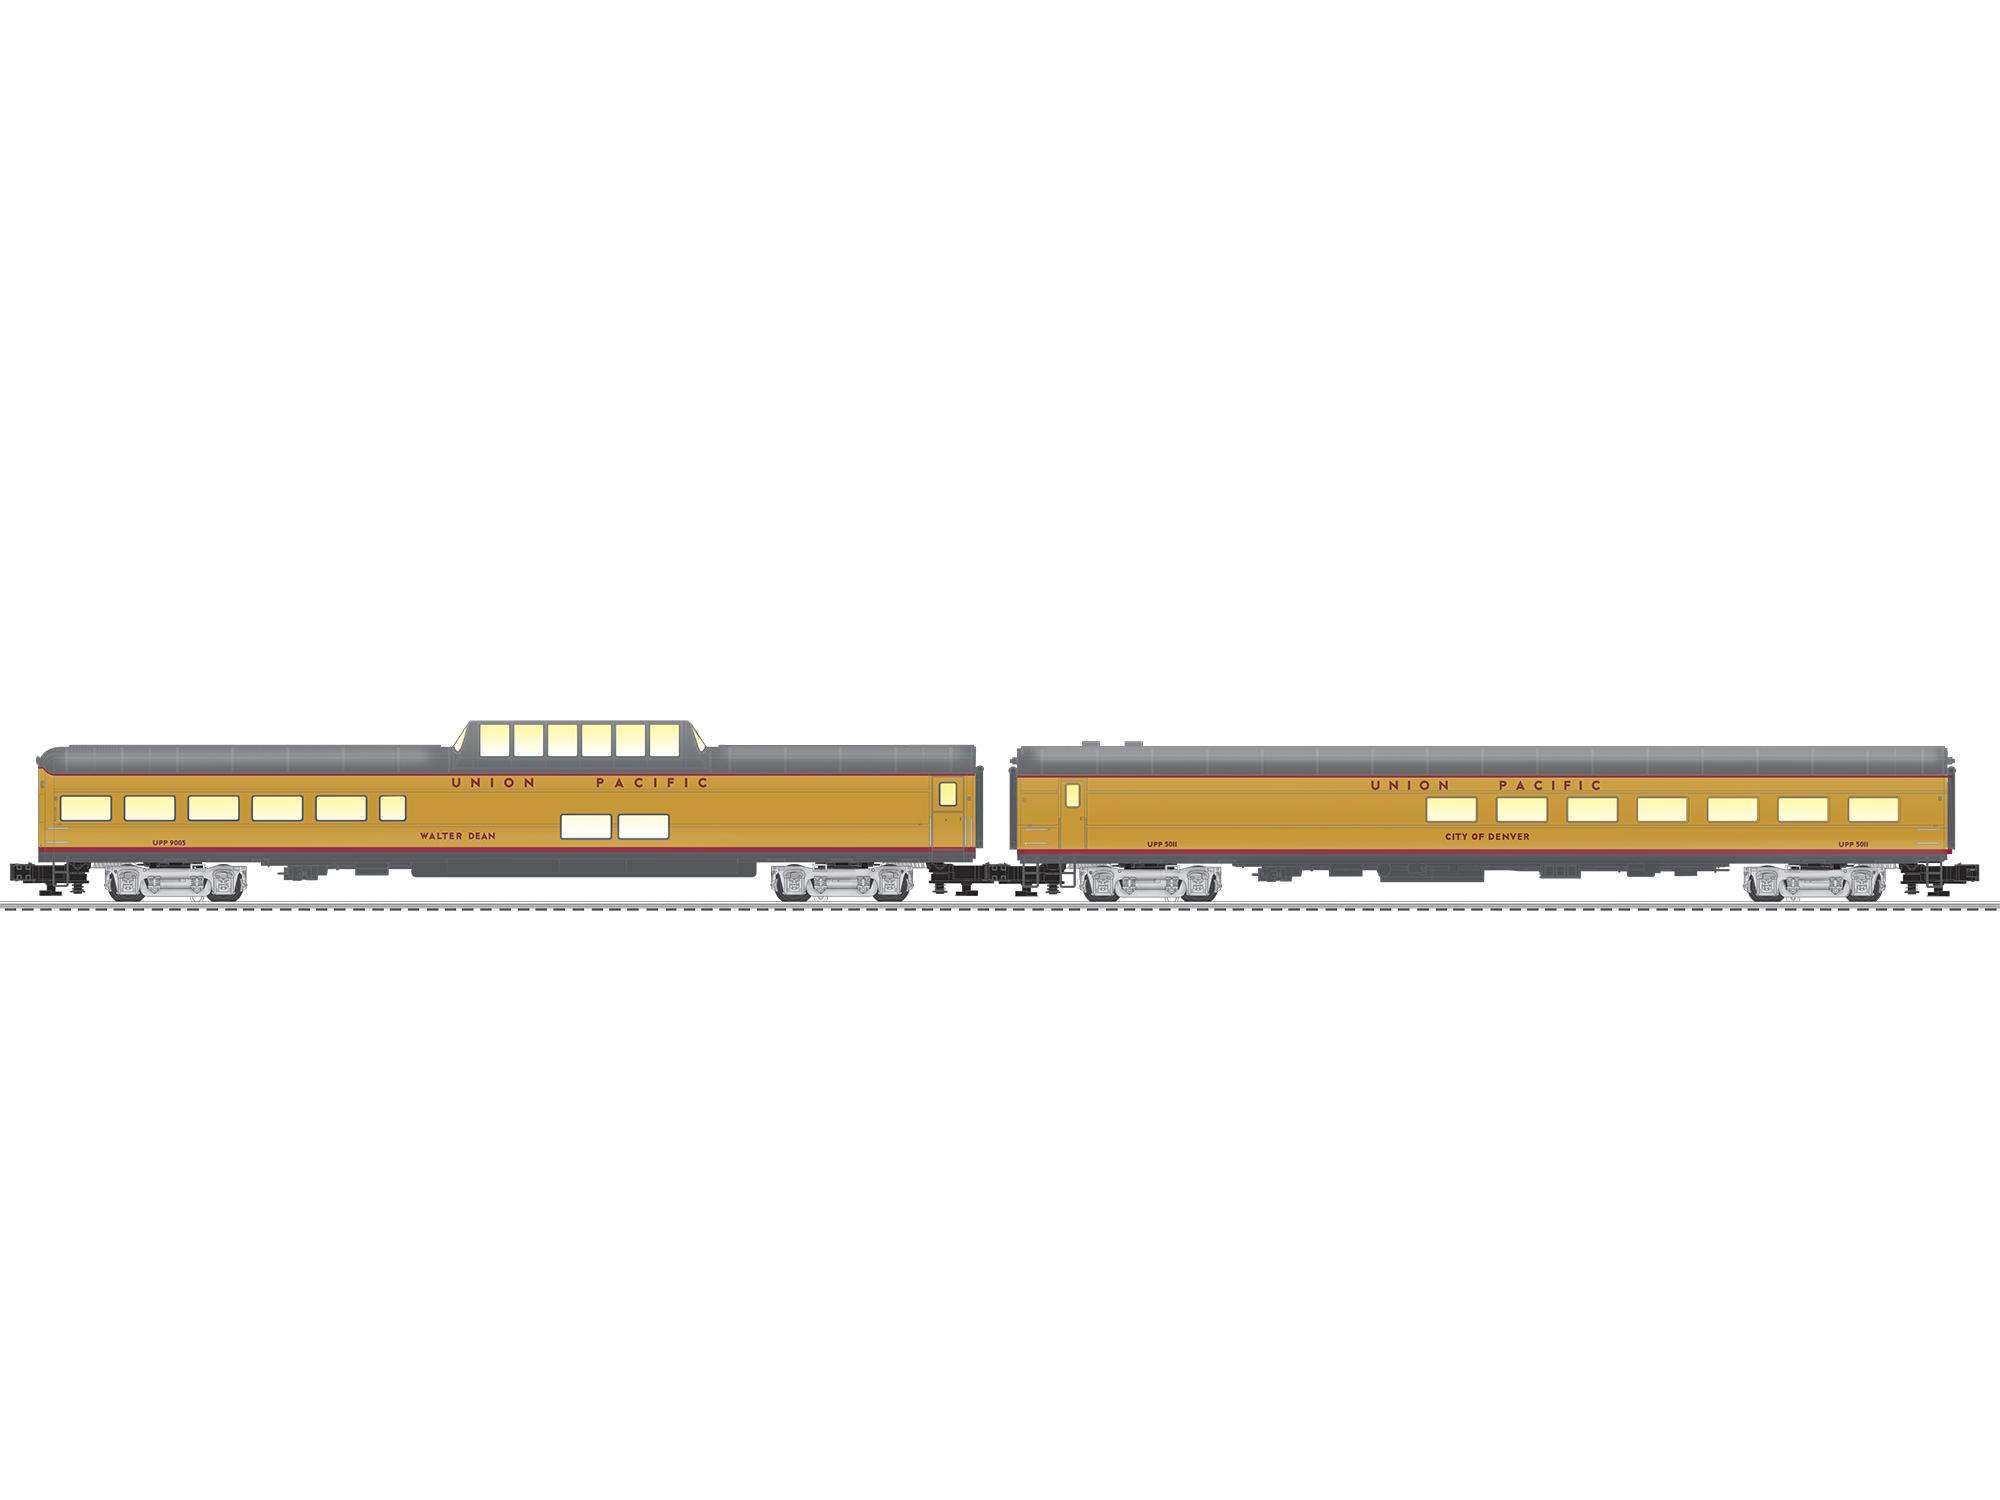 LNL2027230 Lionel O UP Excursion 3 Pack 434-2027230